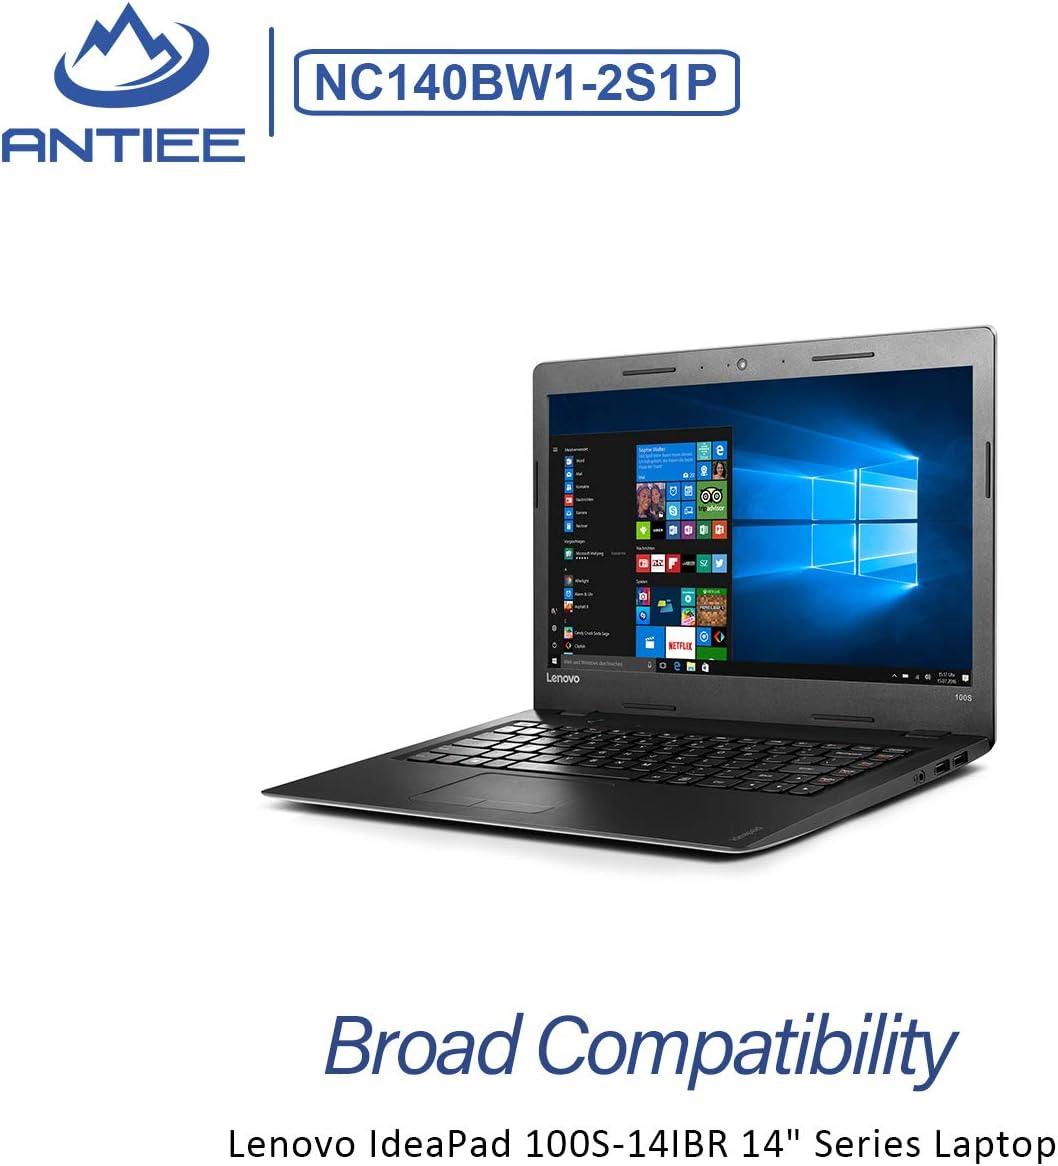 ANTIEE NC140BW1-2S1P Akku f/ür Lenovo IdeaPad 100S-14IBR 14 Series 100S-14IBR 80R9 80R9002WGE 80R90050GE 80R9005MPB 80R900BCAU 100S-14LBR 0813002 NC140BW1-2S1P 5B10K65026 31.92Wh